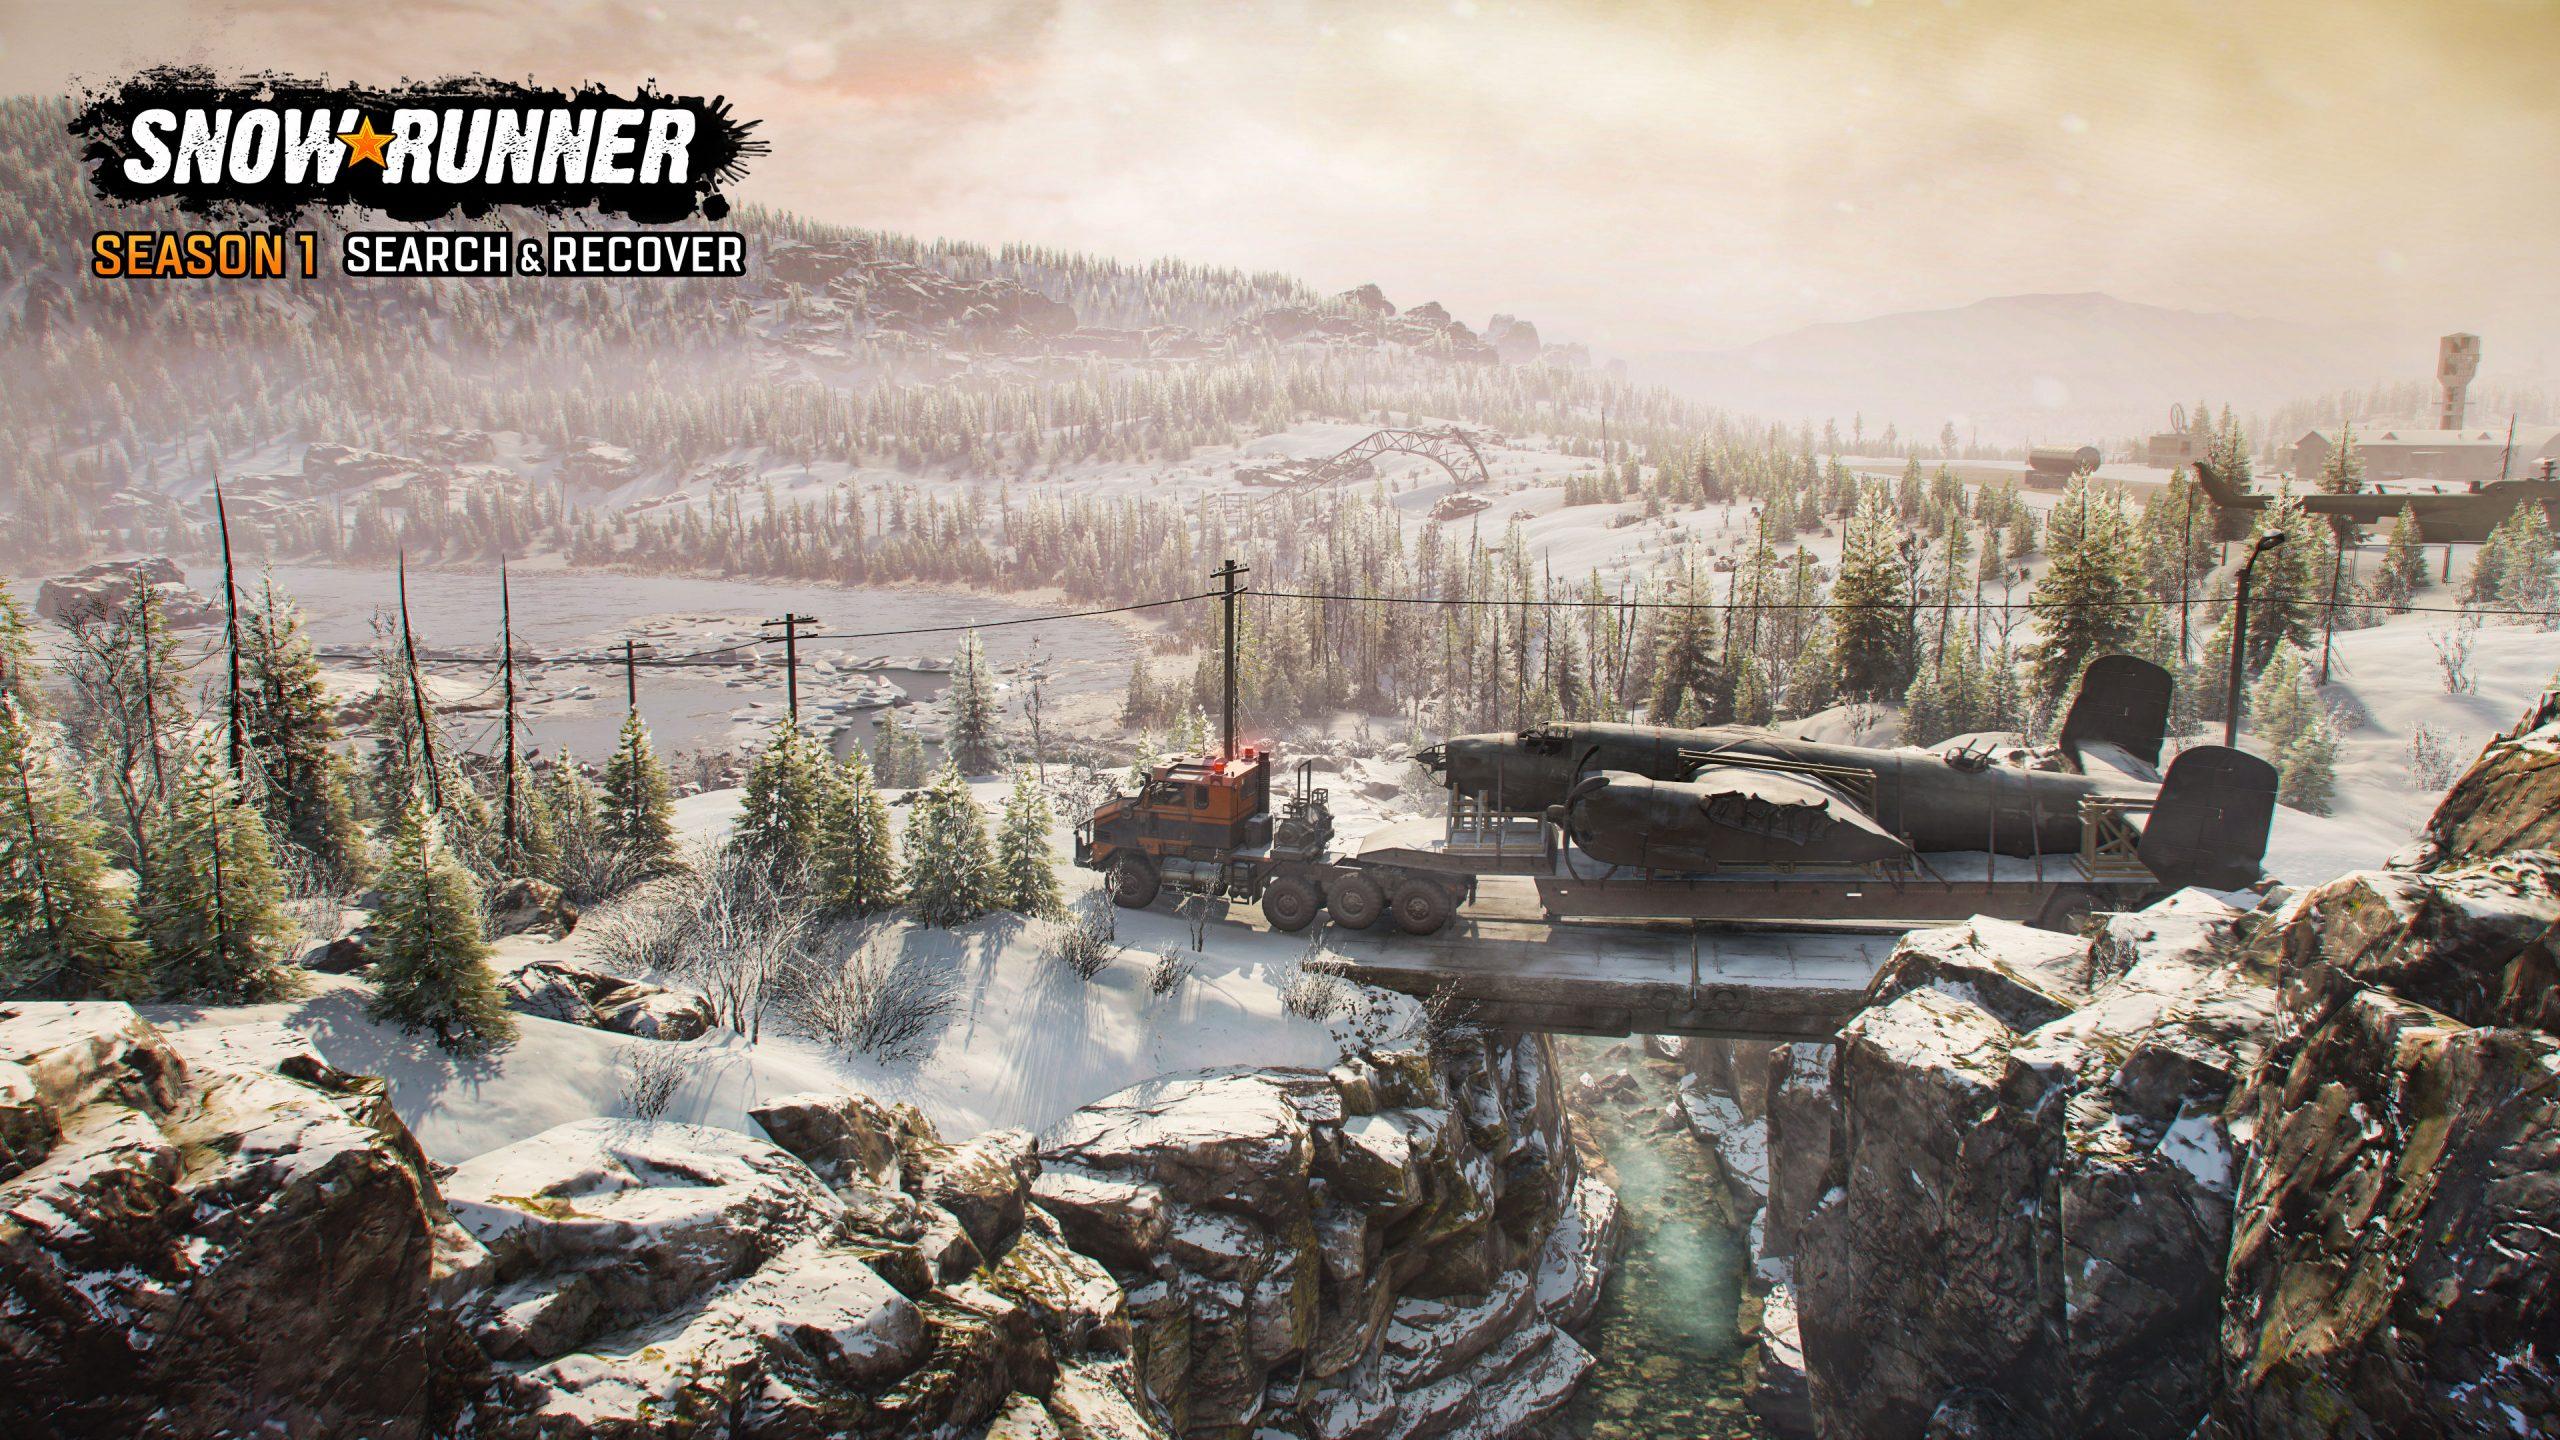 SnowRunner Season1 screenshot logo 07 scaled - SnowRunner Gets Its First Big DLC Next Week